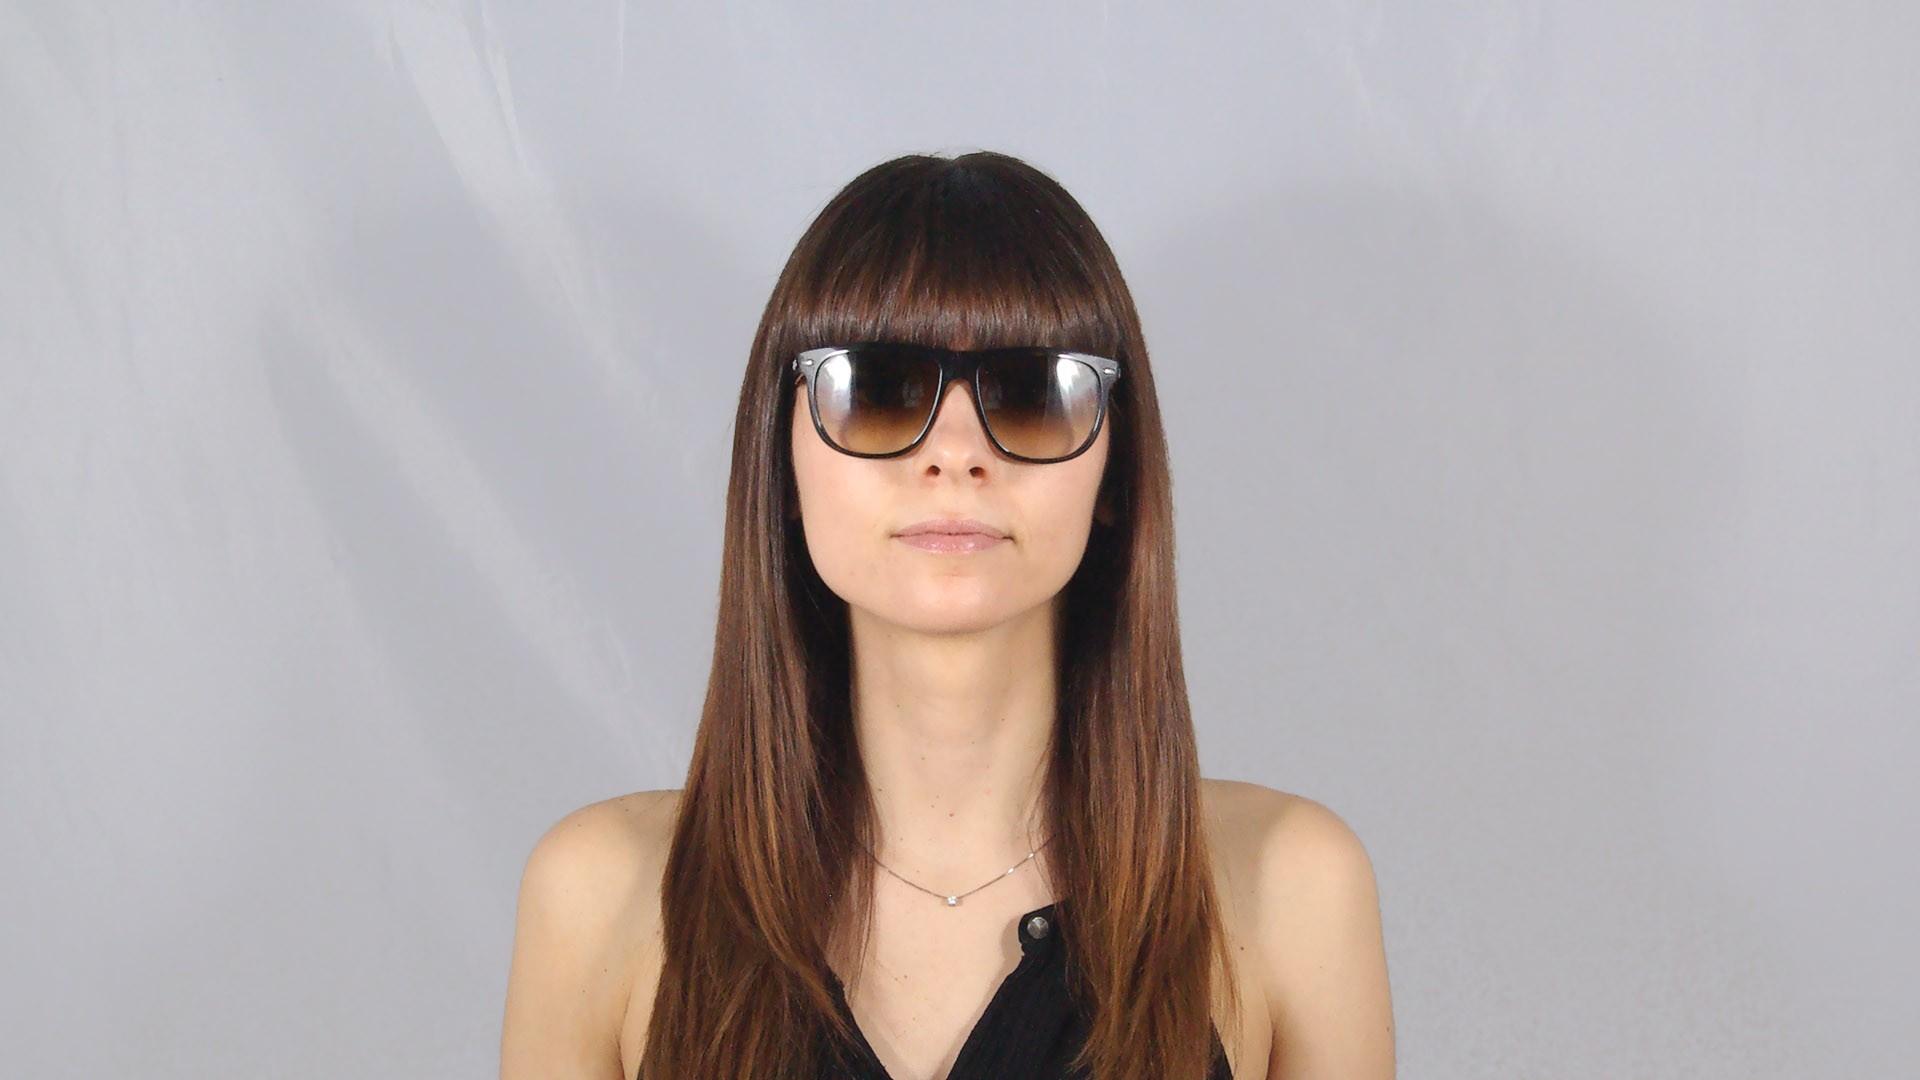 27c4d08de25 Sunglasses Ray-Ban RB4147 710 51 56-15 Tortoise Medium Gradient